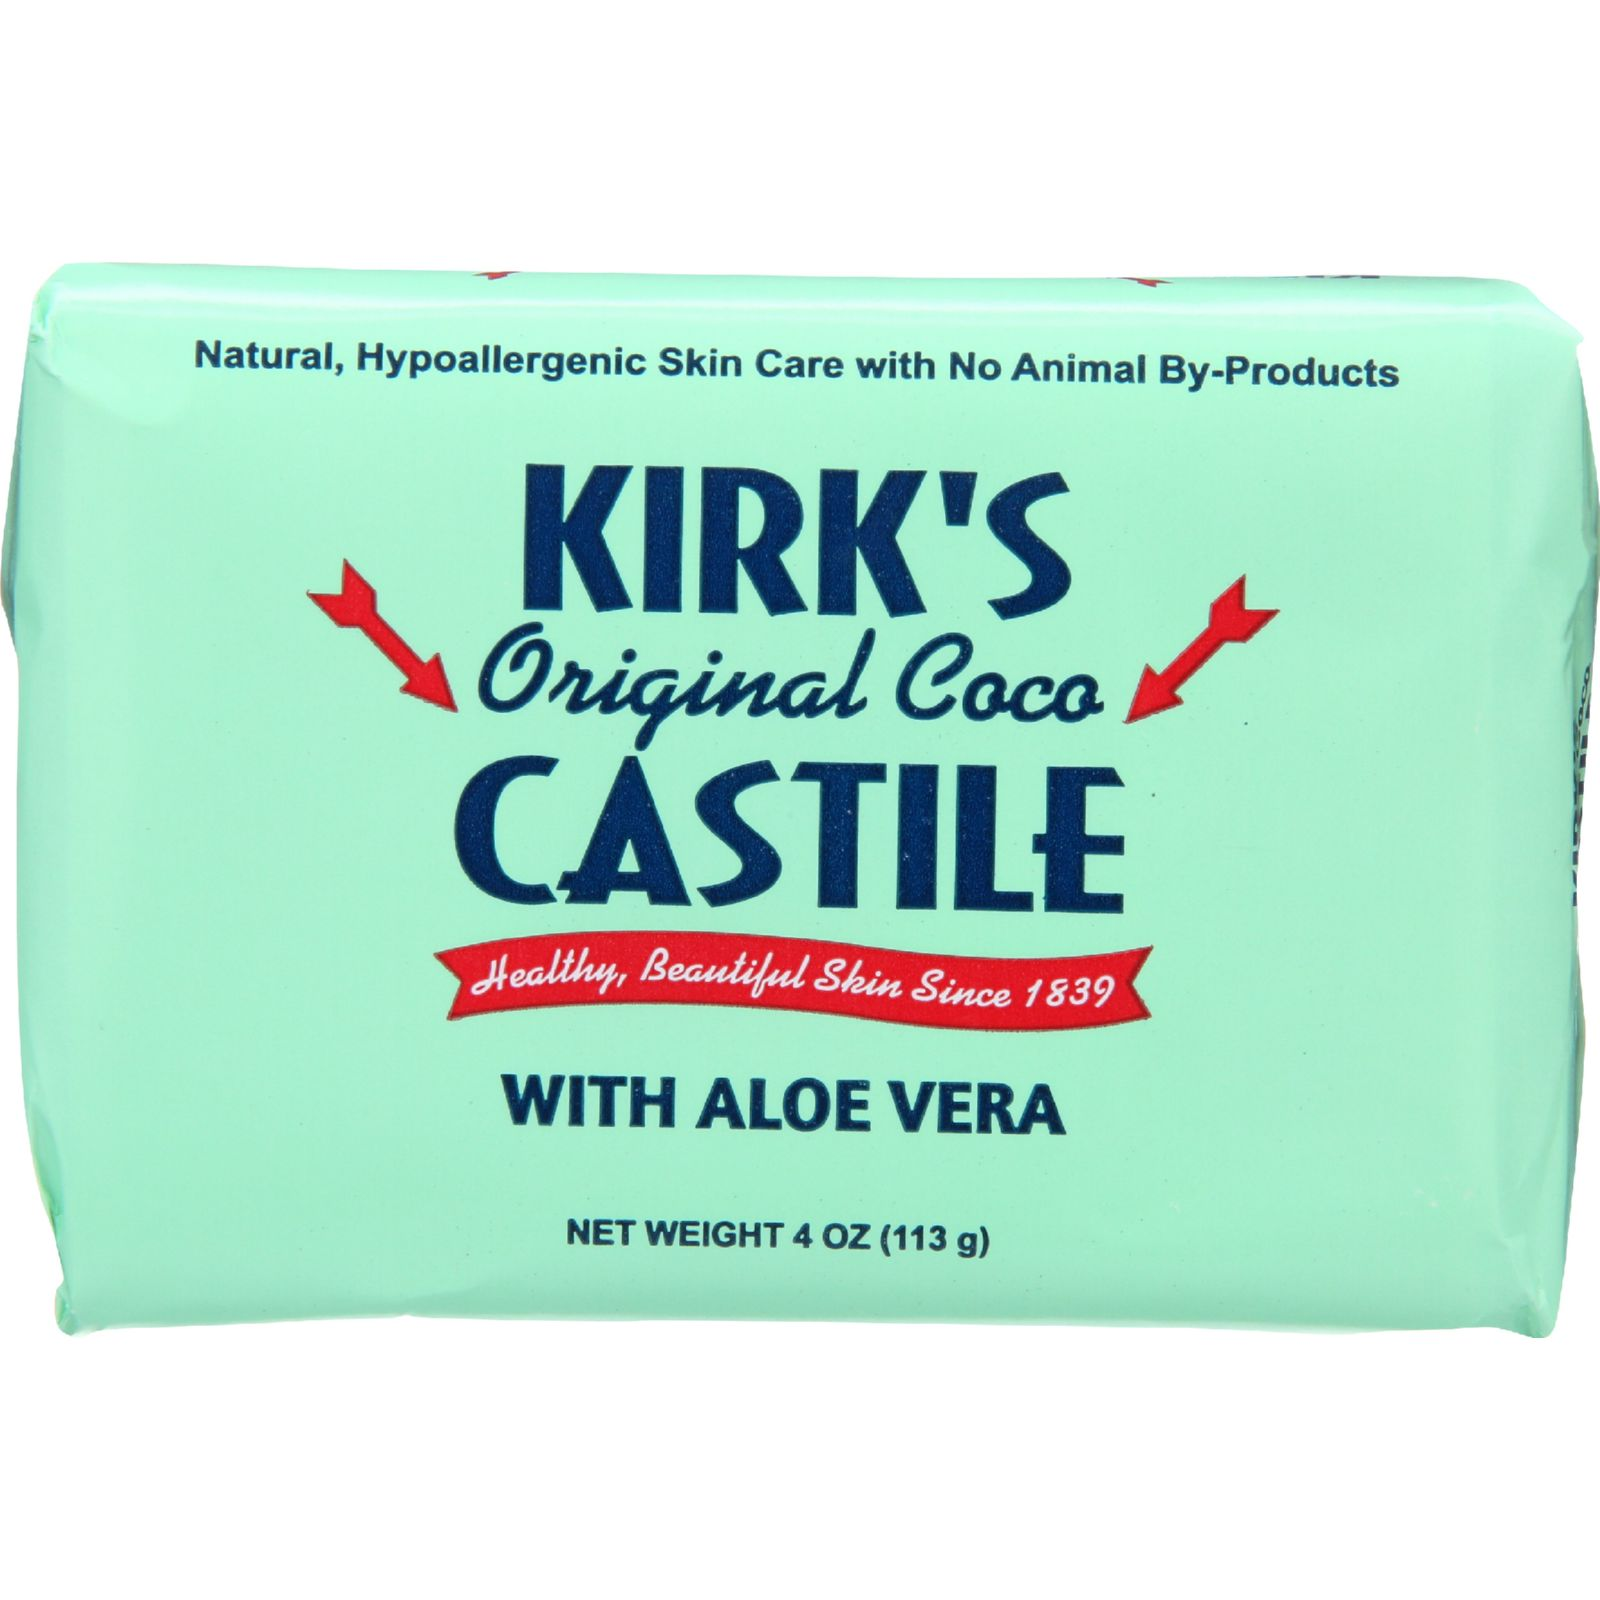 Kirks Natural Bar Soap  Coco Castile  Aloe Vera  4 oz